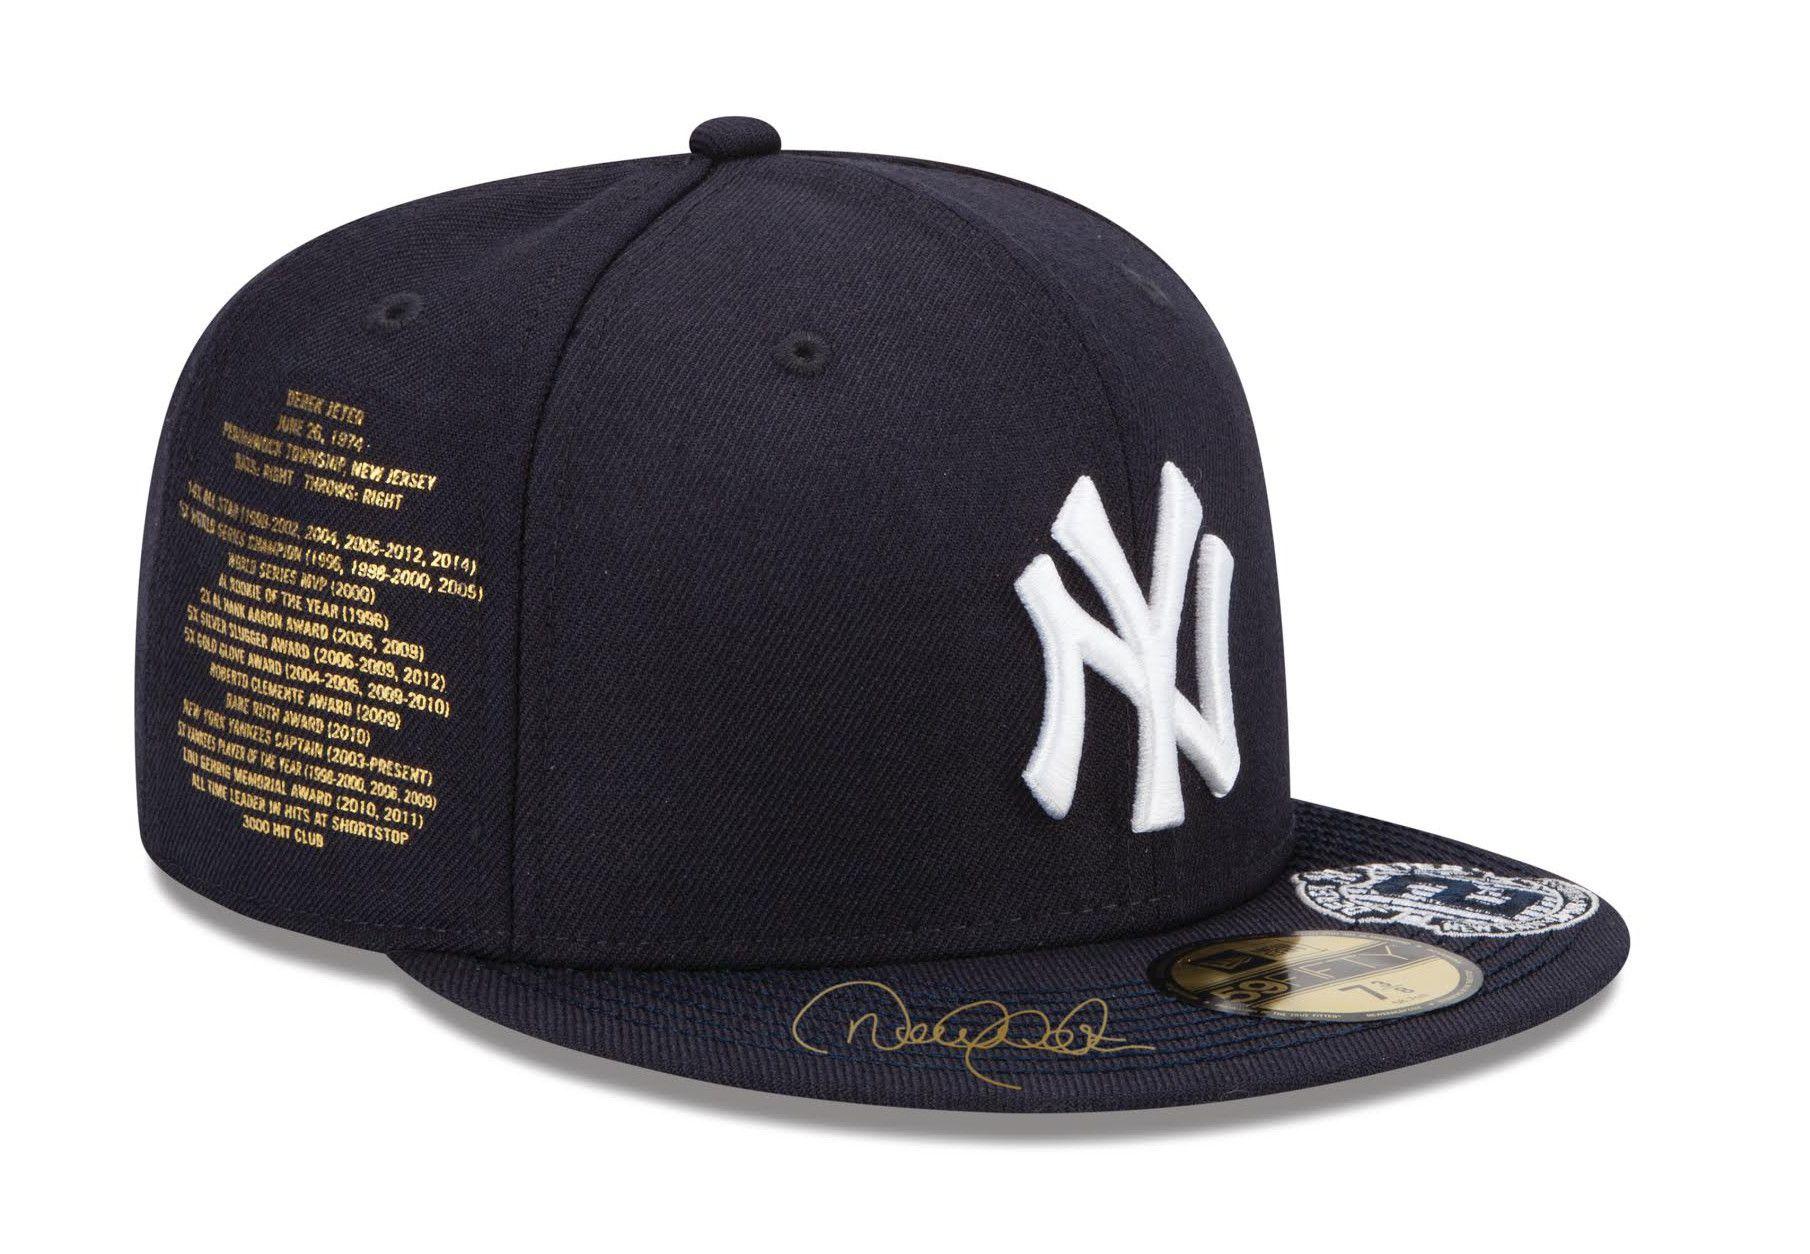 New Era For Atmos Nyc Ny Yankees Derek Jeter Fitted Hat Hats For Men Fitted Hats Derek Jeter